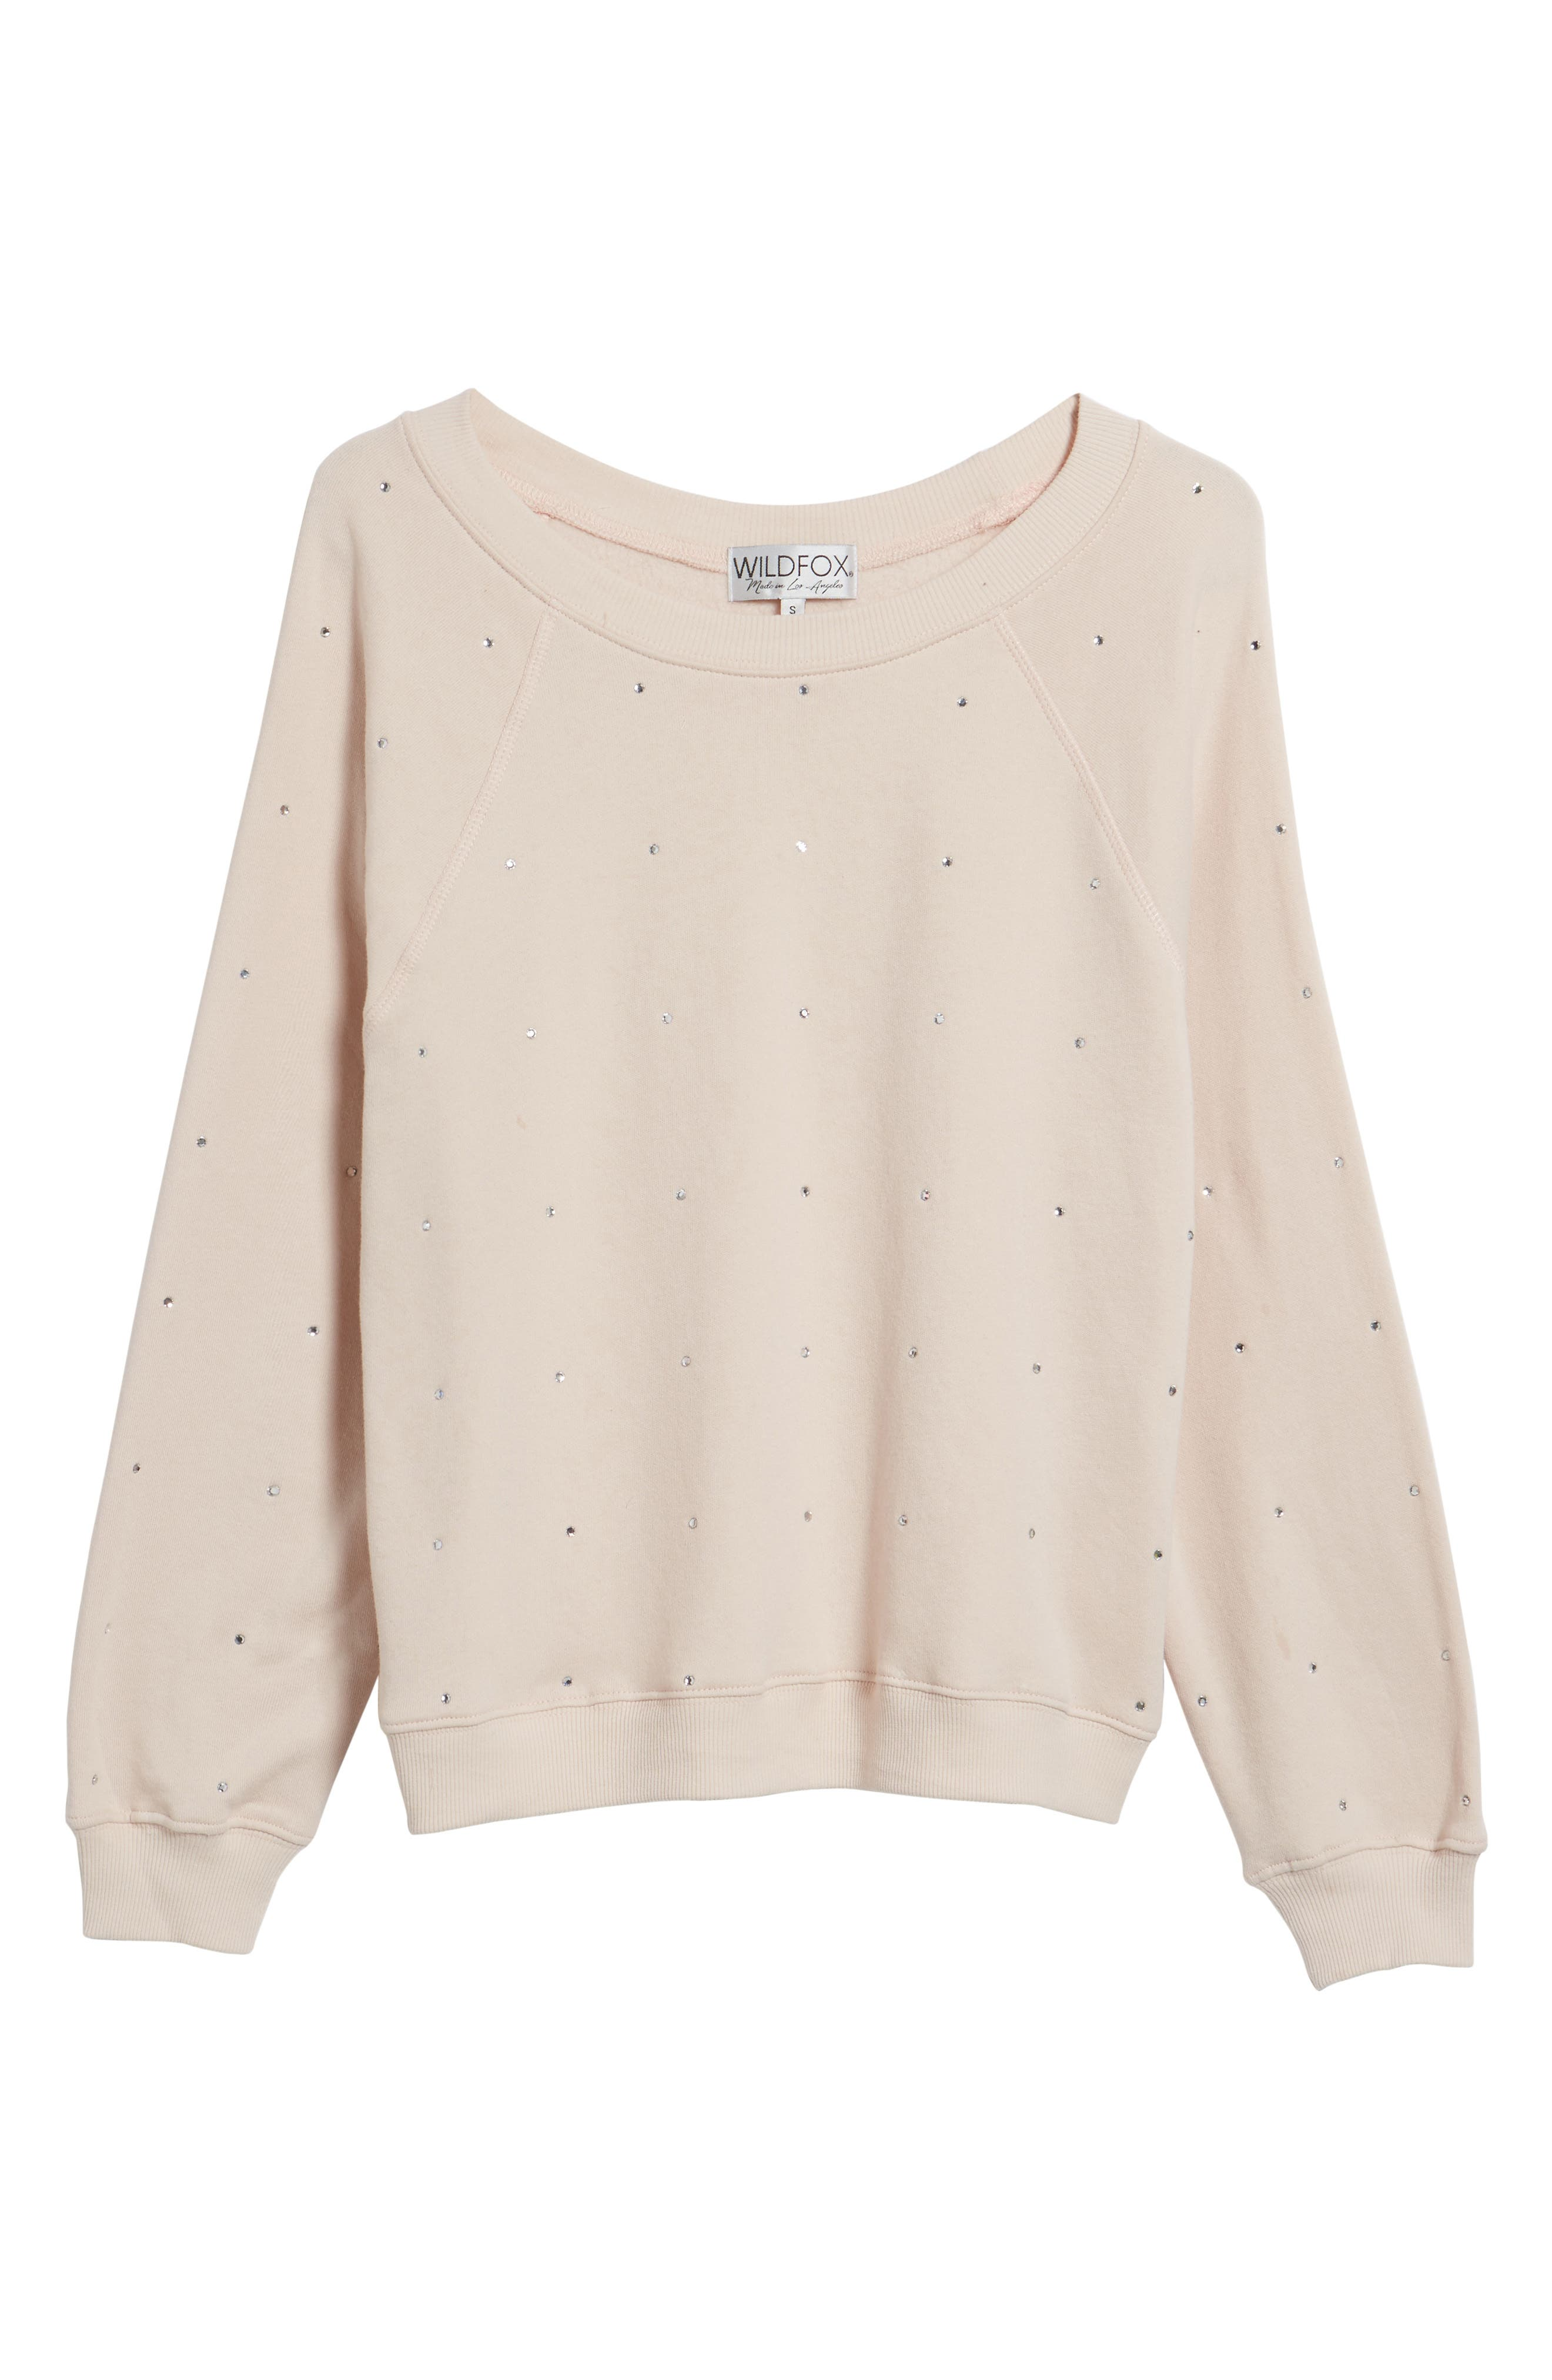 Glitz Sweatshirt,                             Alternate thumbnail 6, color,                             530